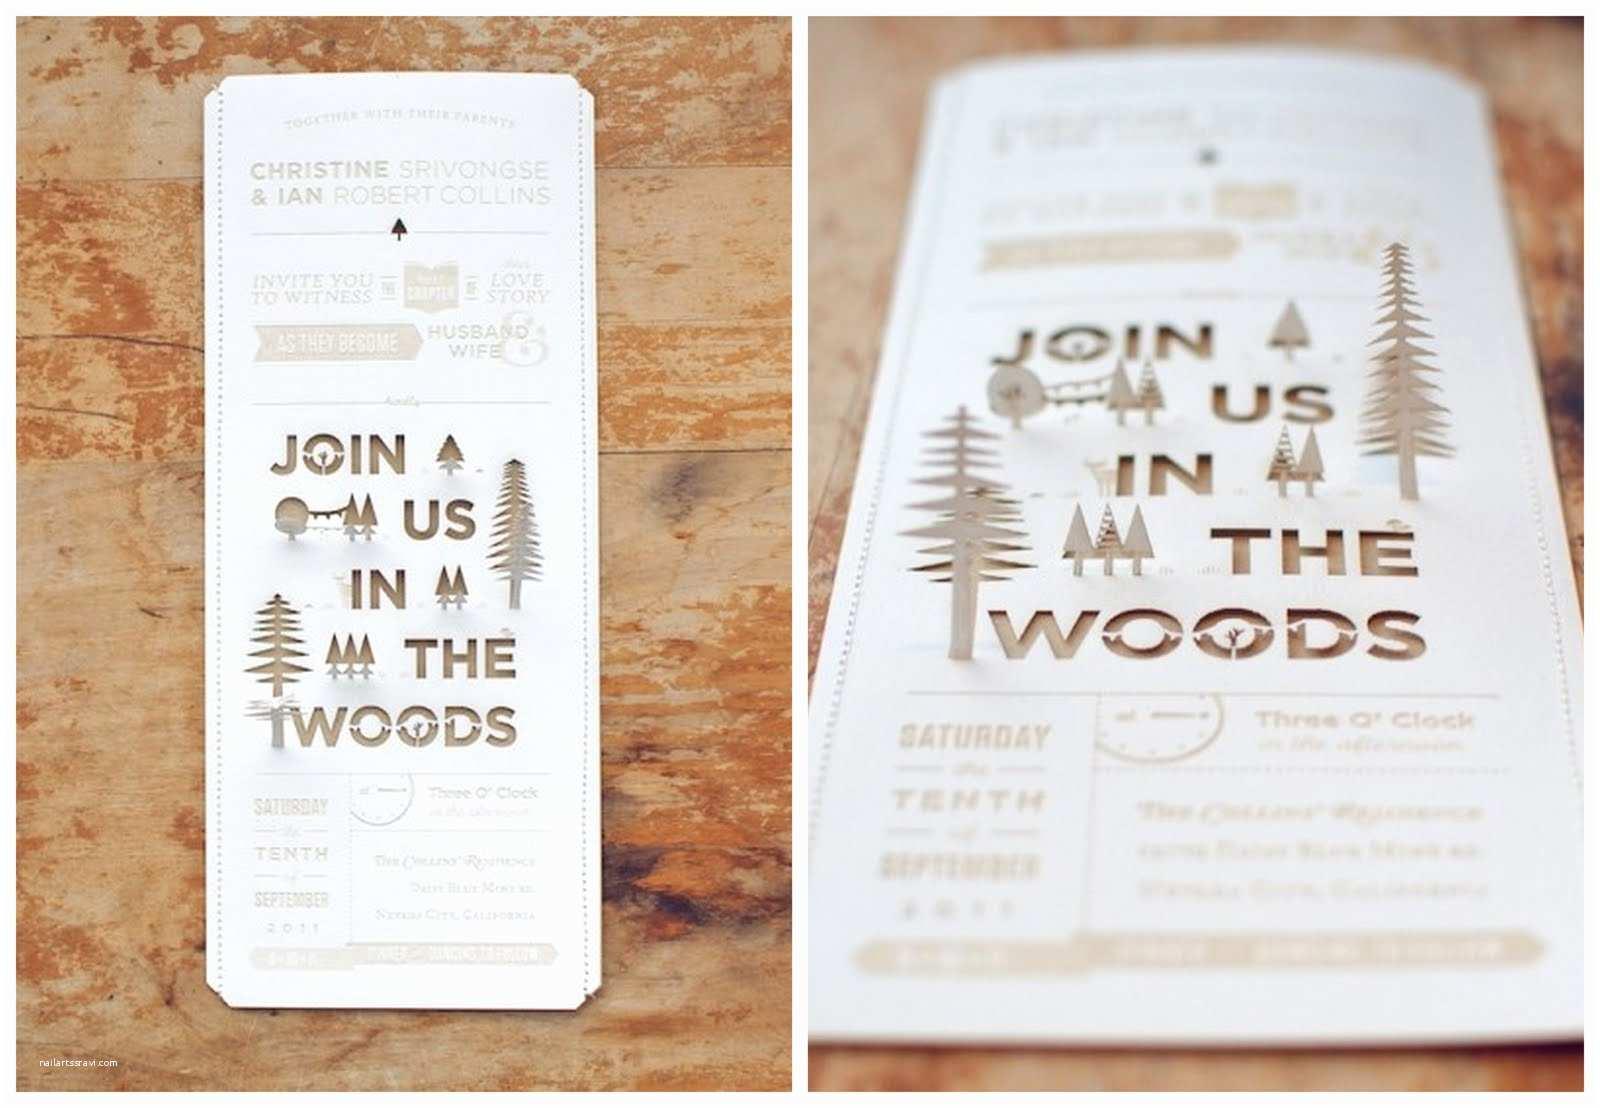 Creative Wedding Invitation Wording Rustic Creative Wedding Invitations